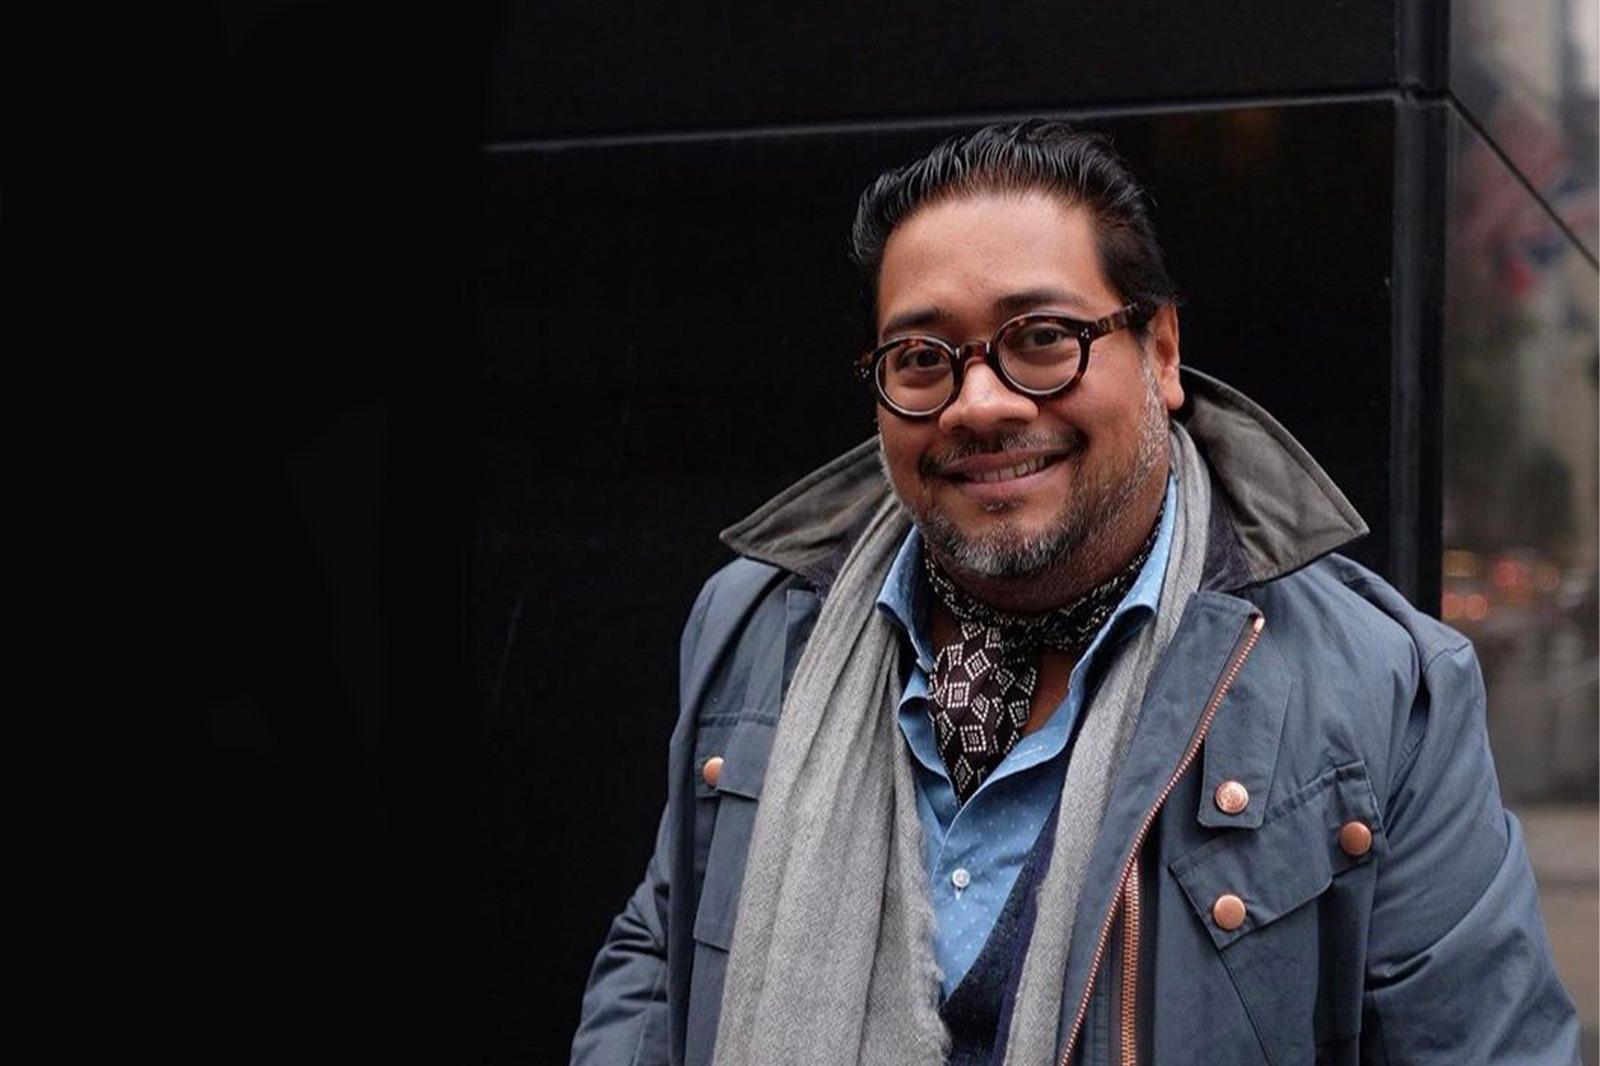 'FIRST FAVOURITE FINAL' – AHMED RAHMAN